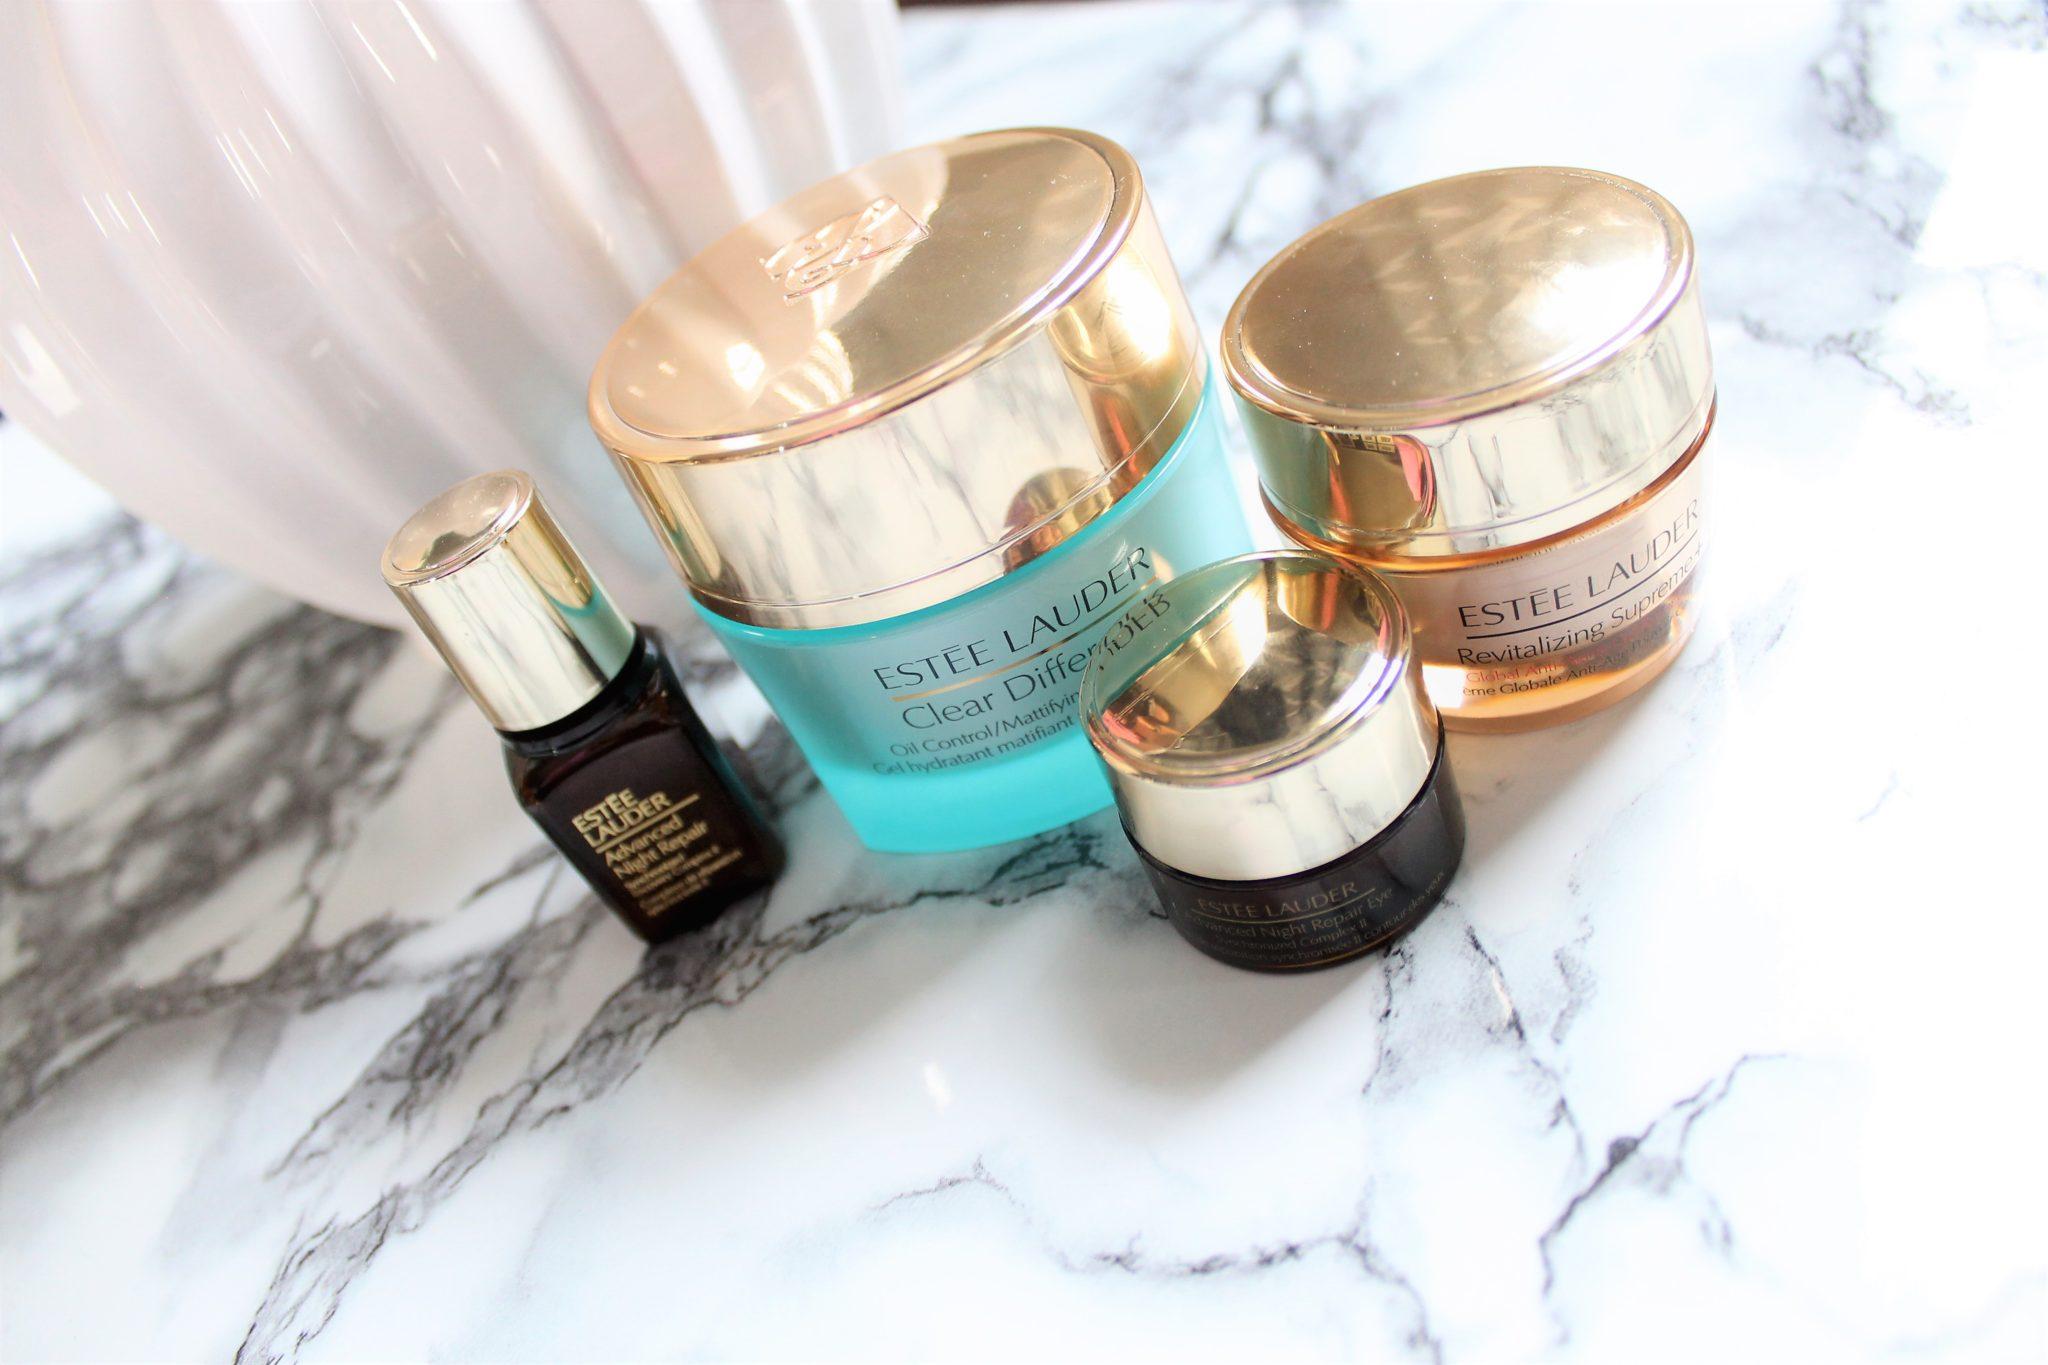 estee-lauder-skincare-makeup-review